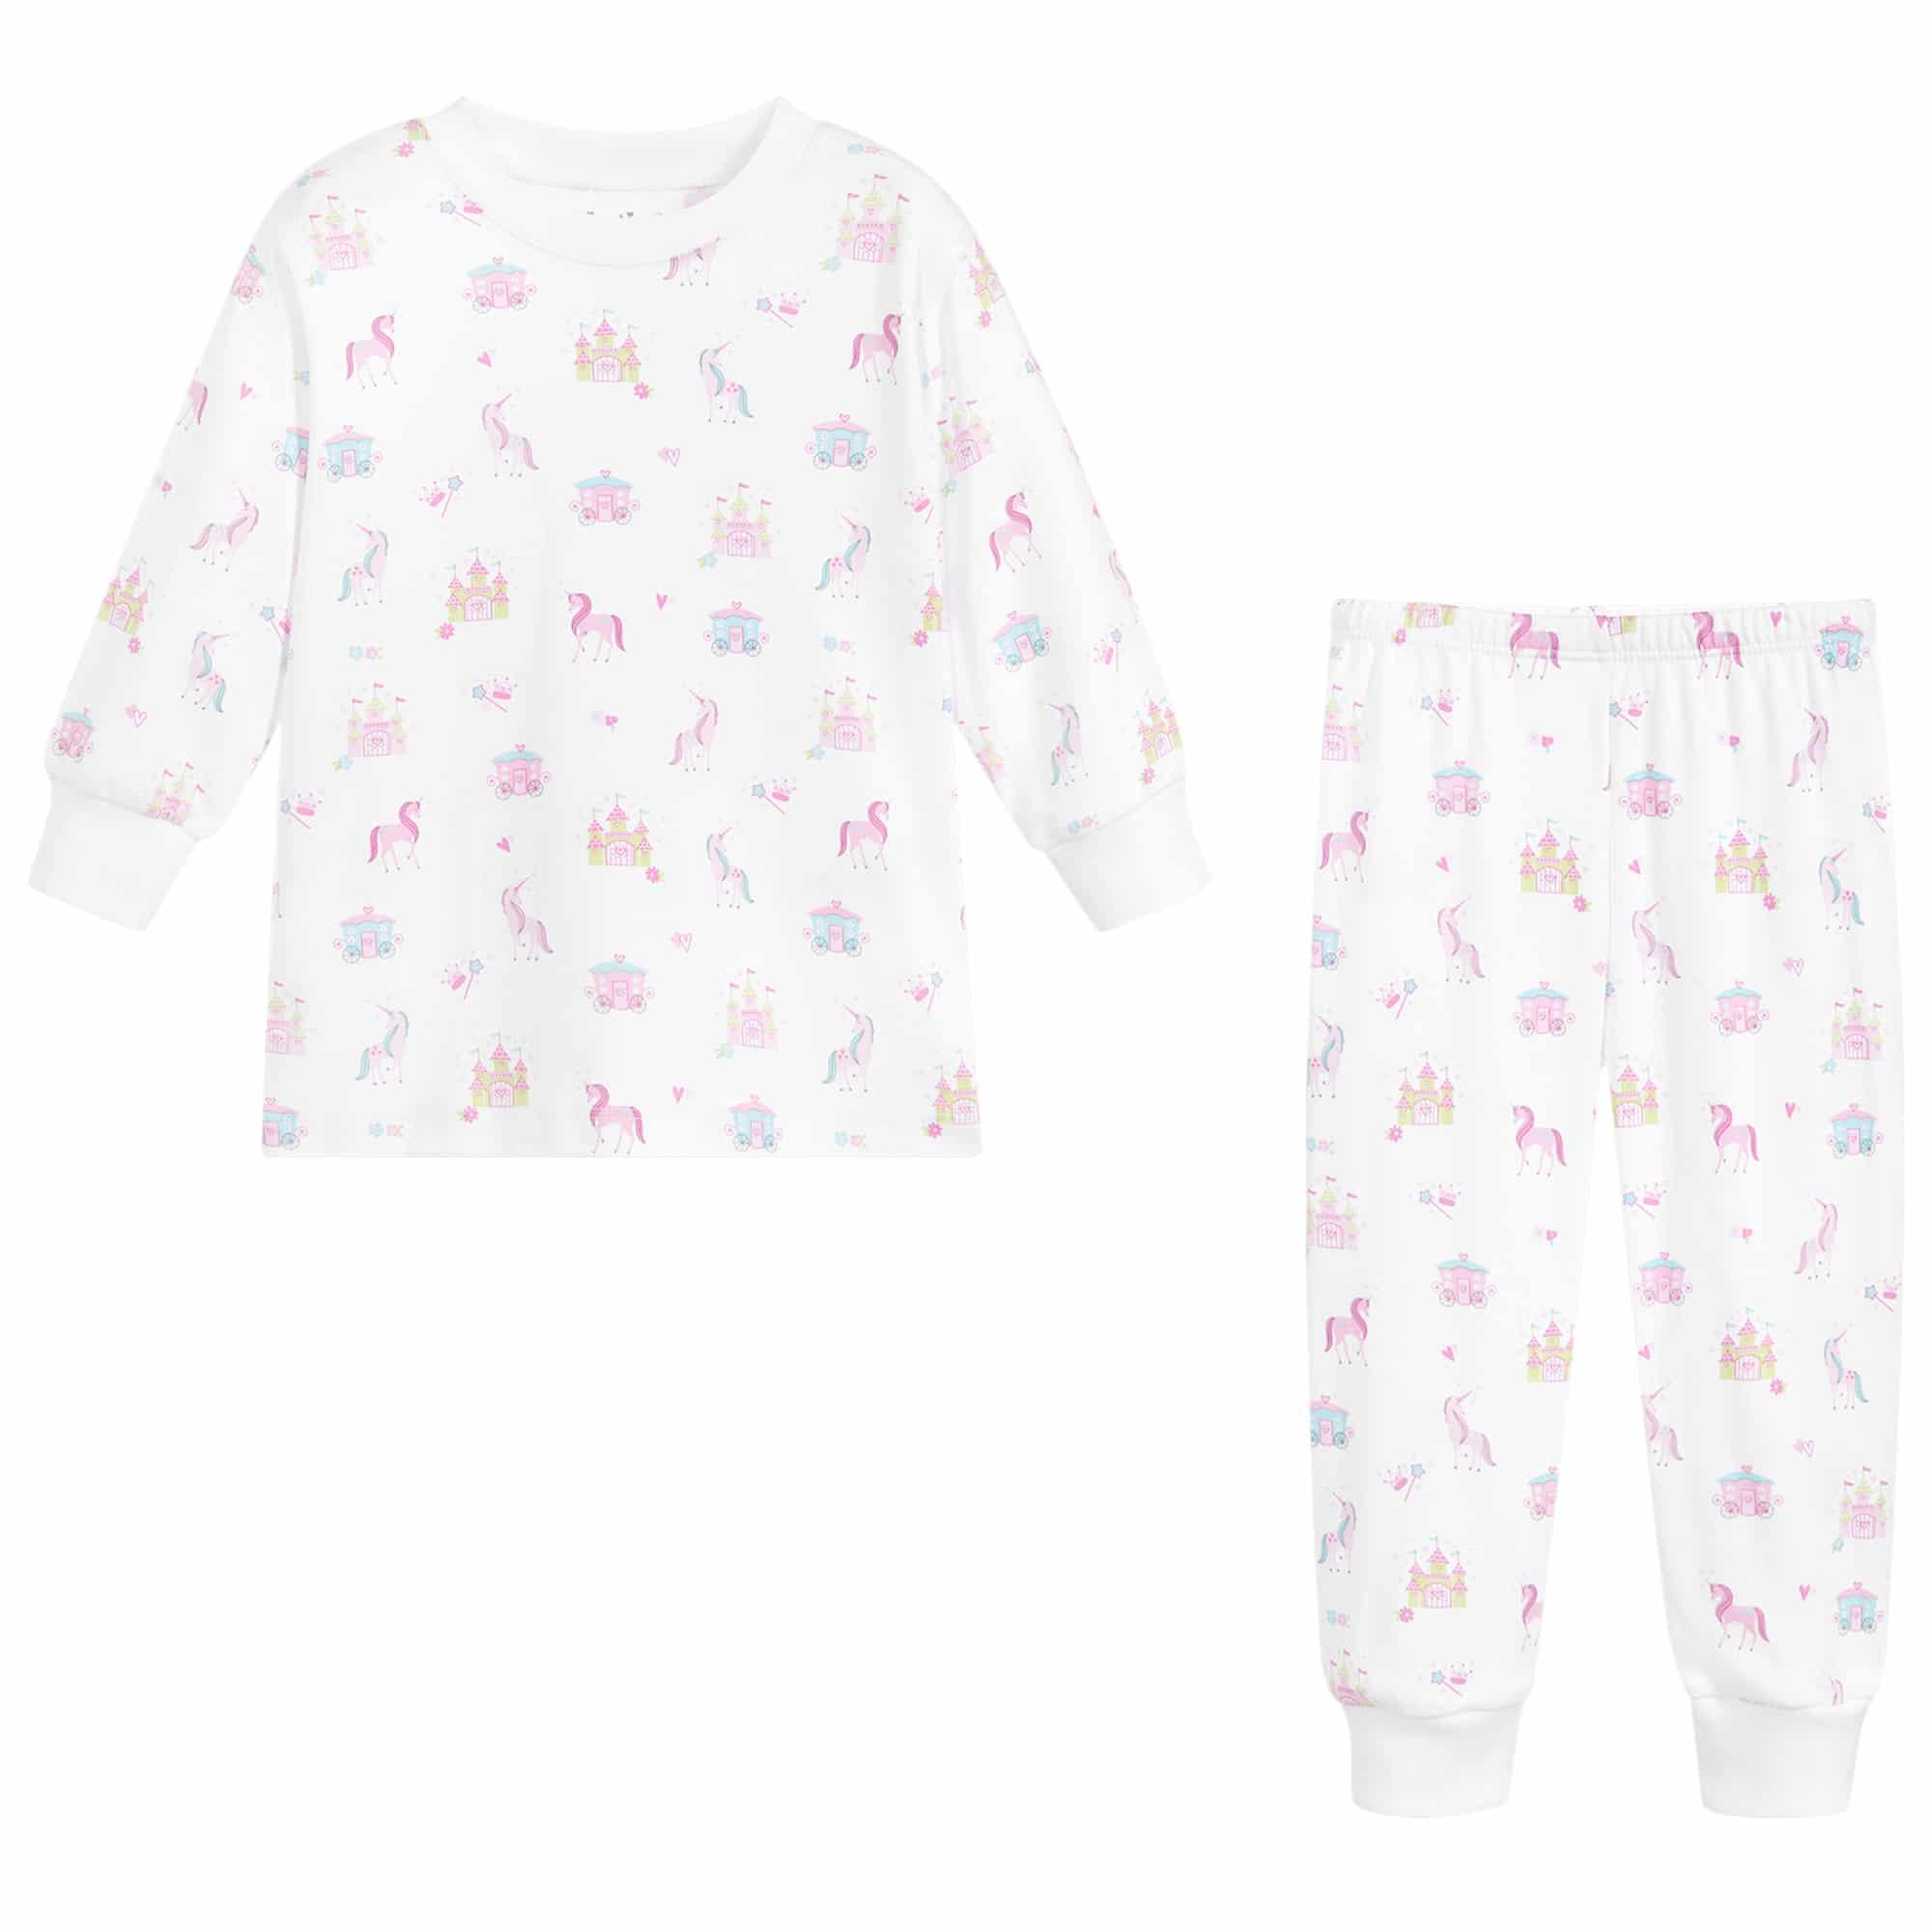 kissy-kissy-white-pima-cotton-pyjamas-288580-995a12b4e24e57153096131179c9de1c6653a938 (1)